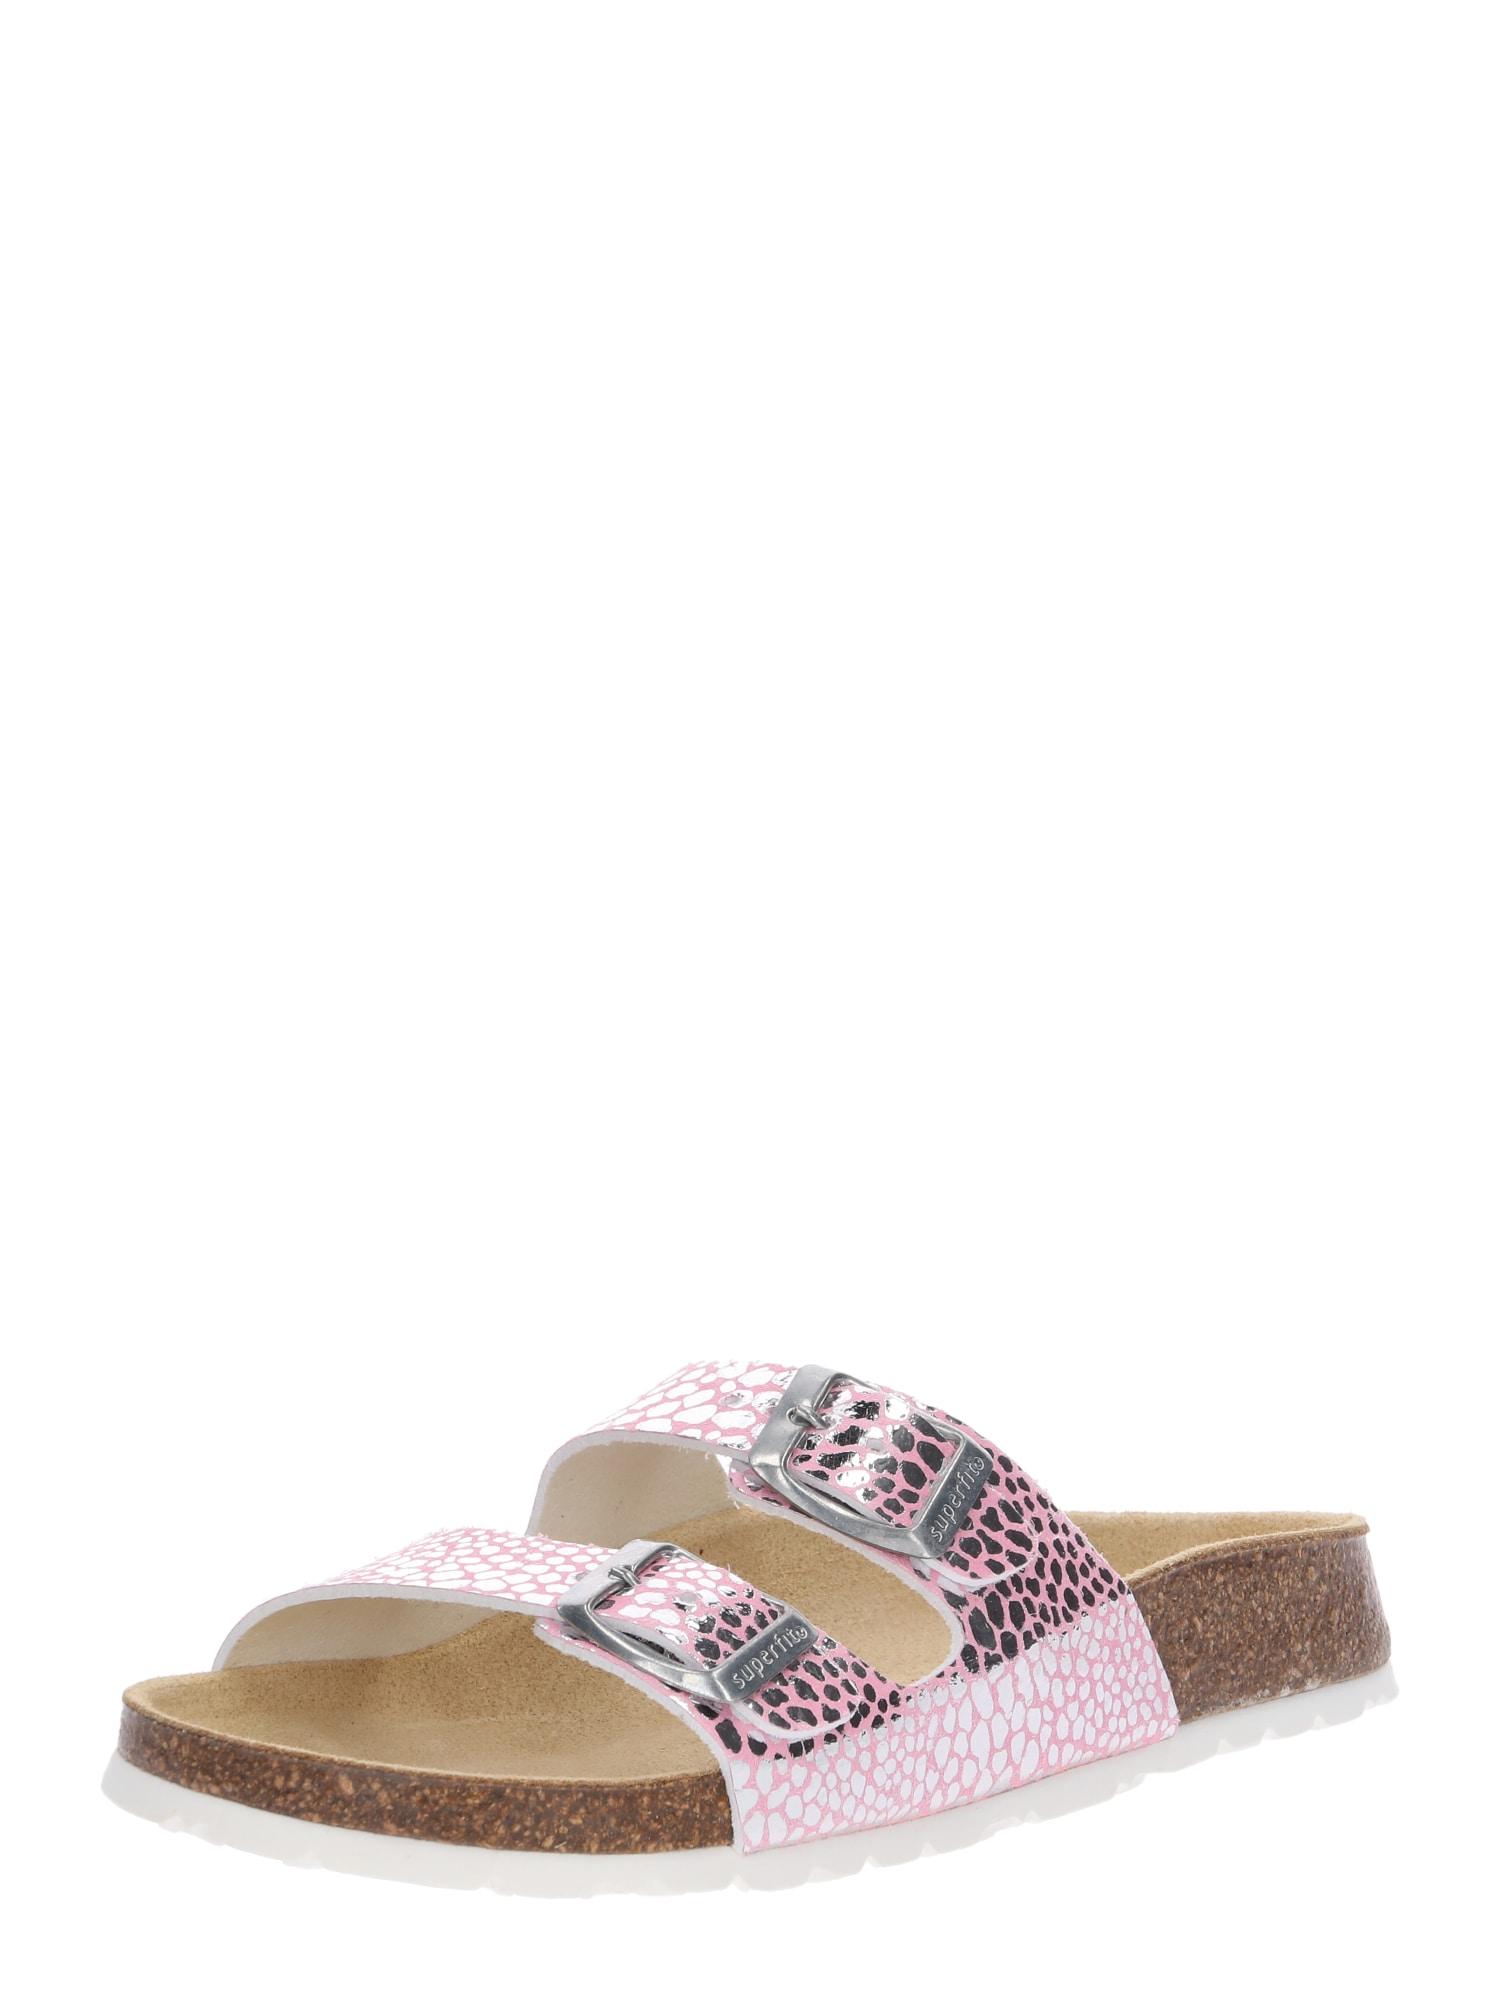 Sandály růžová stříbrná SUPERFIT